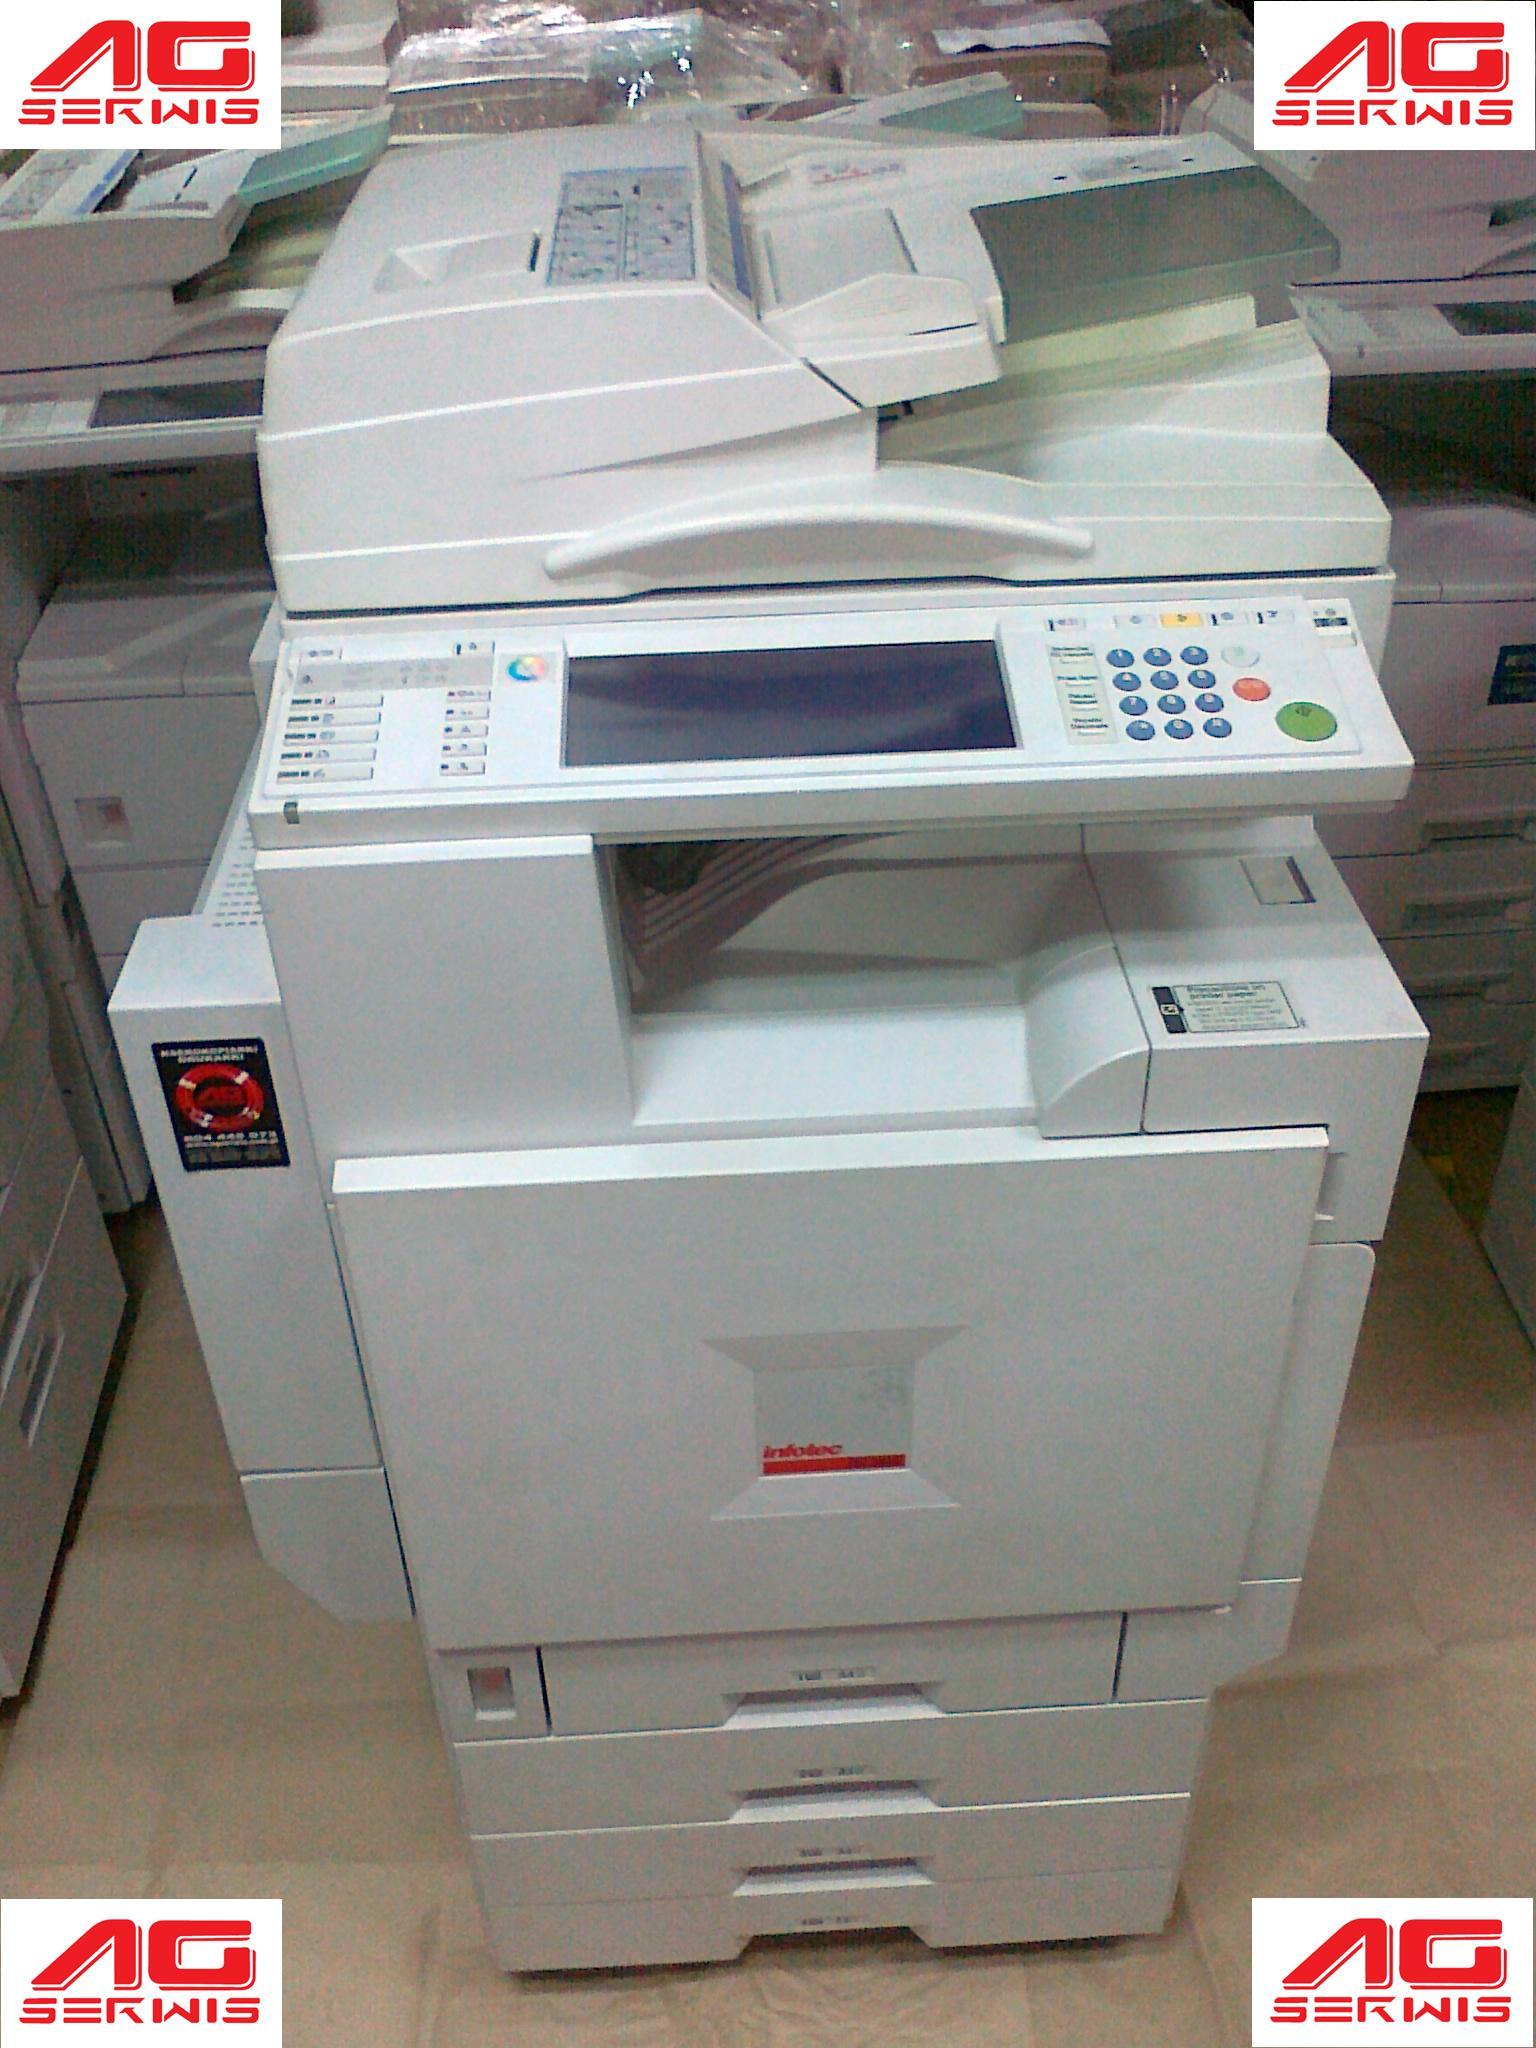 kolorowe drukarki wielofunkcyjne